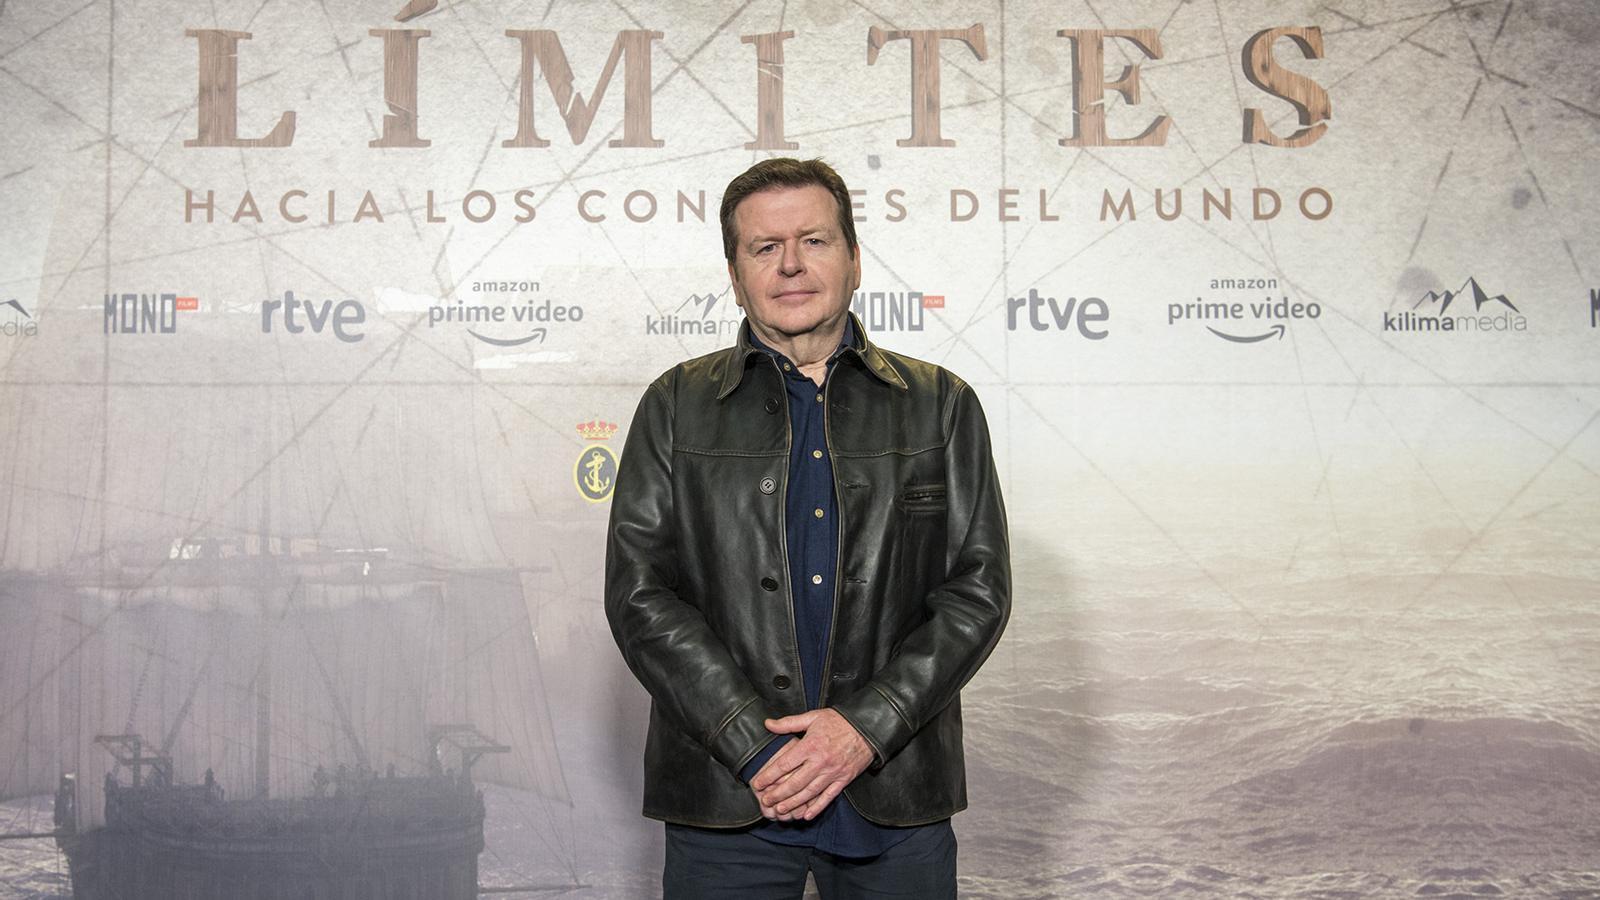 Simon West dirigirà la sèrie de TVE i Amazon sobre la primera volta al món